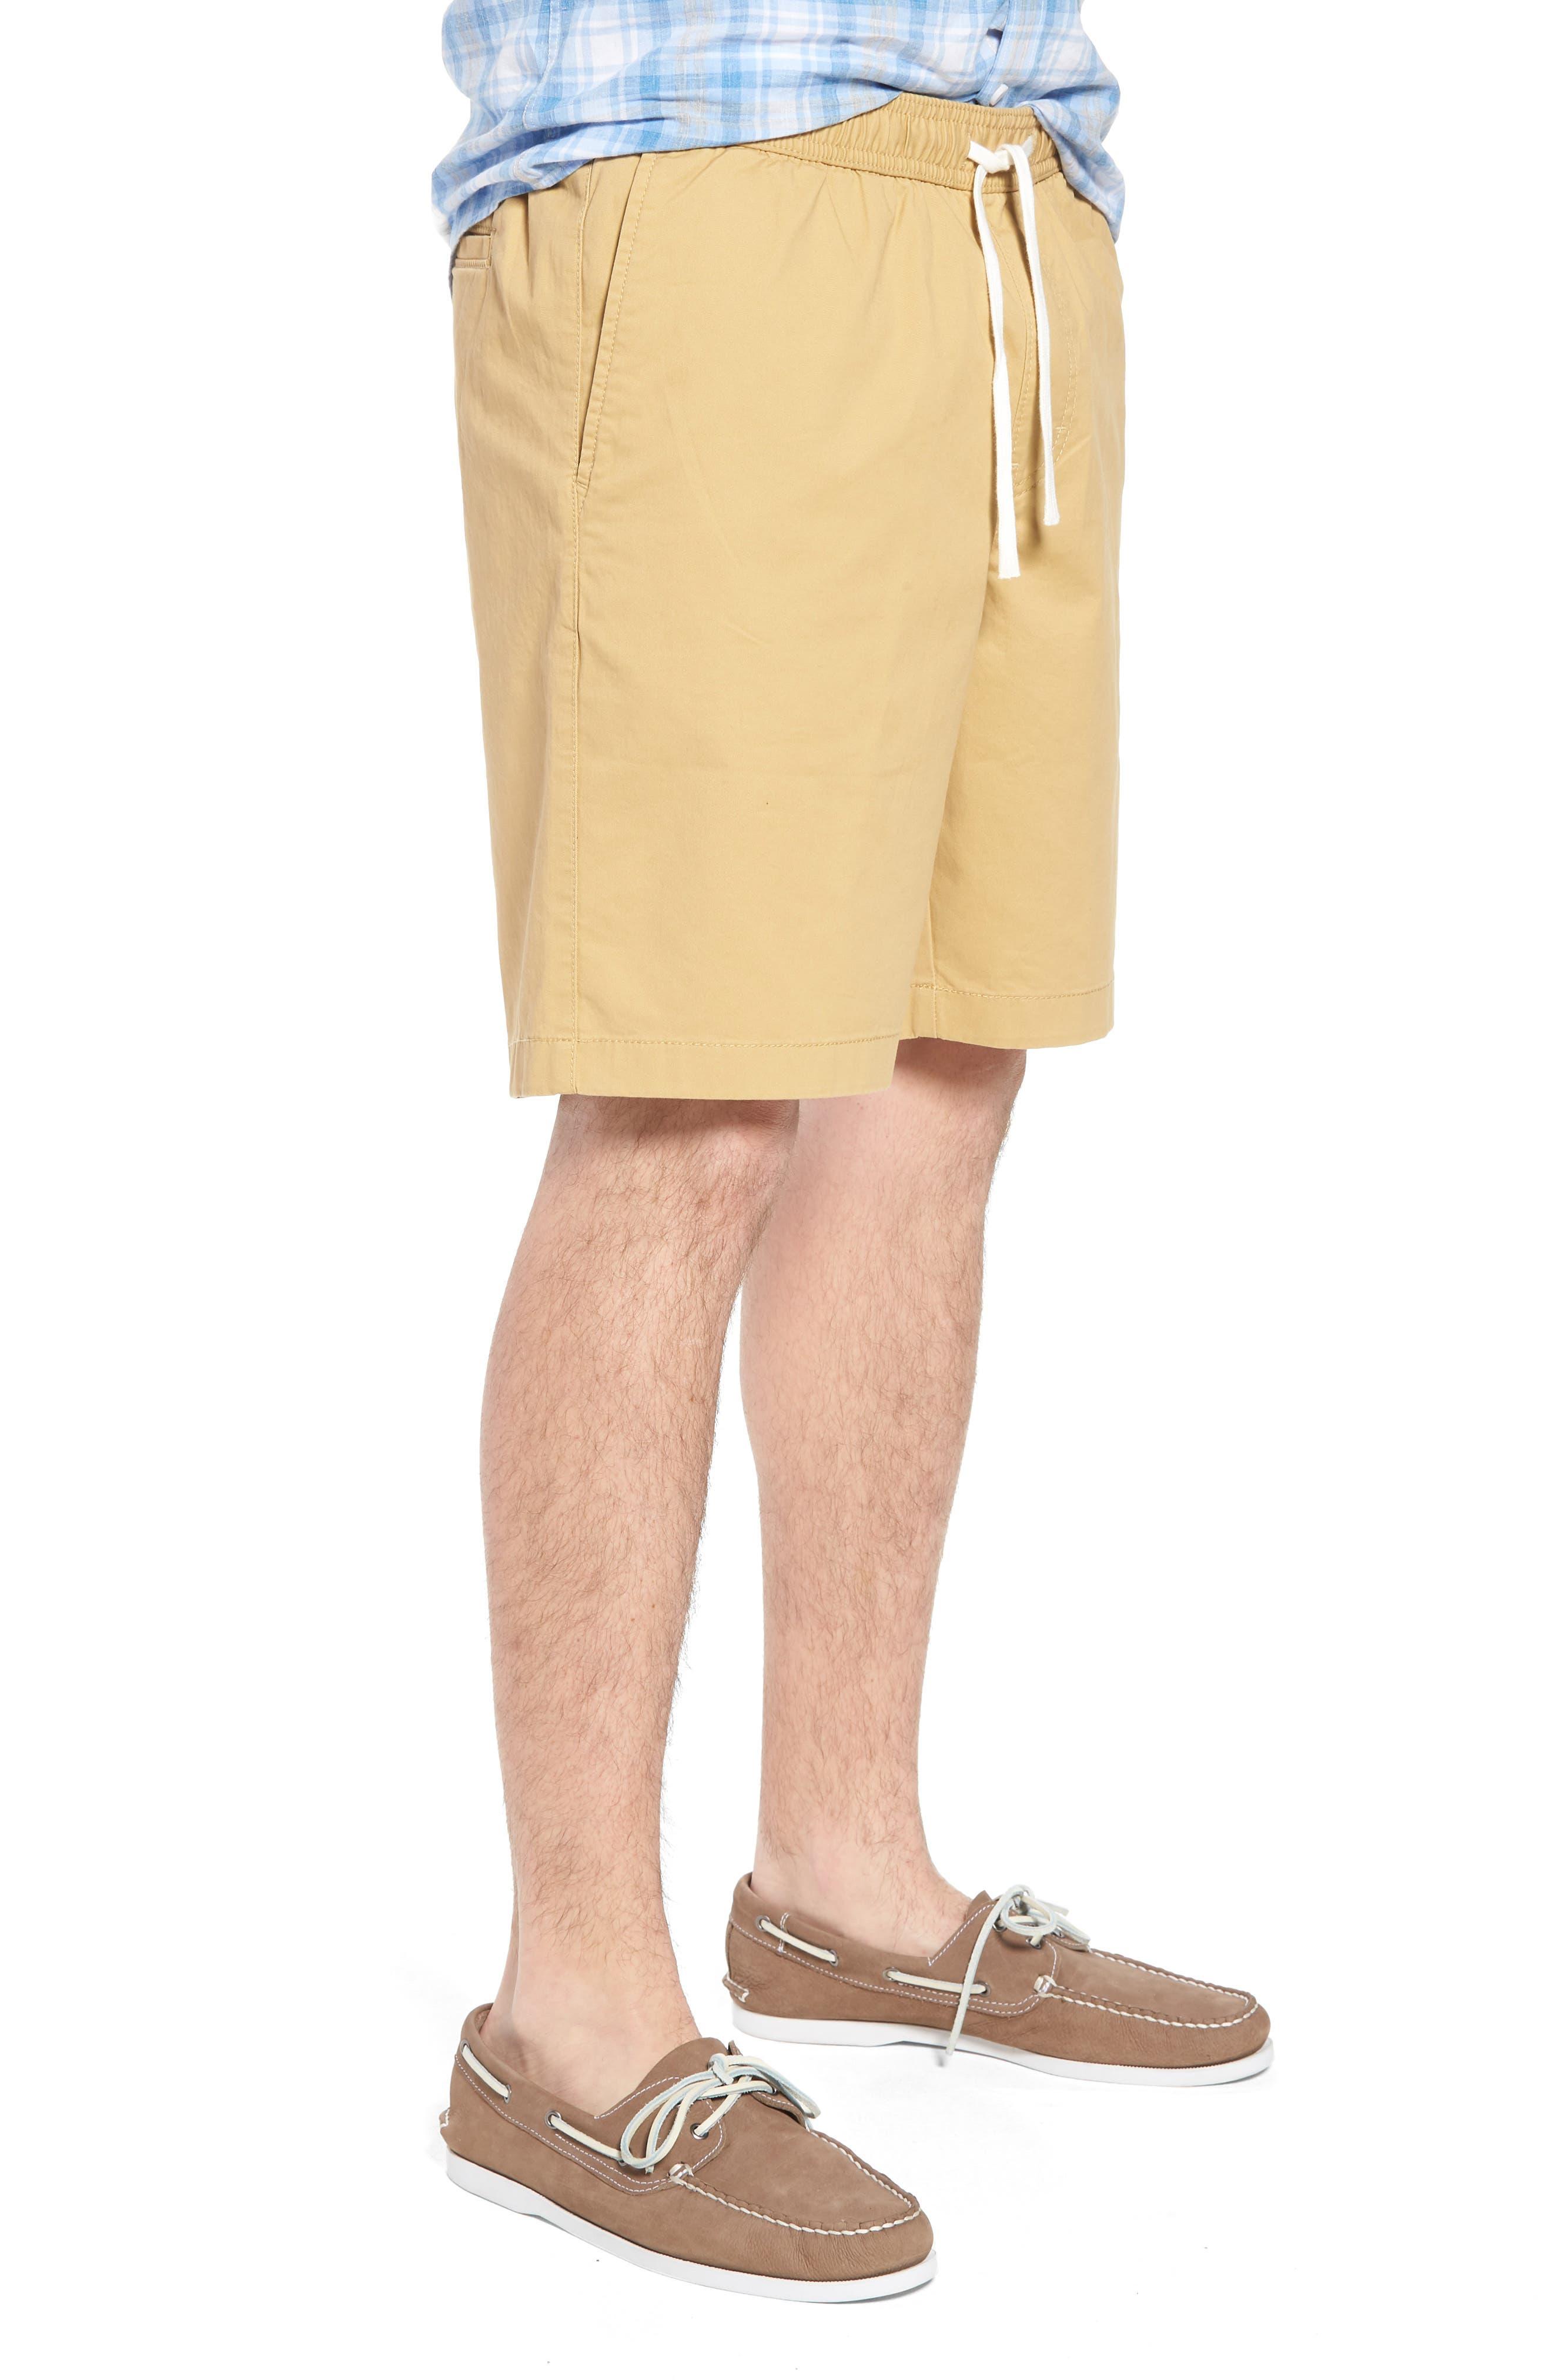 Ballard Slim Fit Shorts,                             Alternate thumbnail 3, color,                             Tan Lark